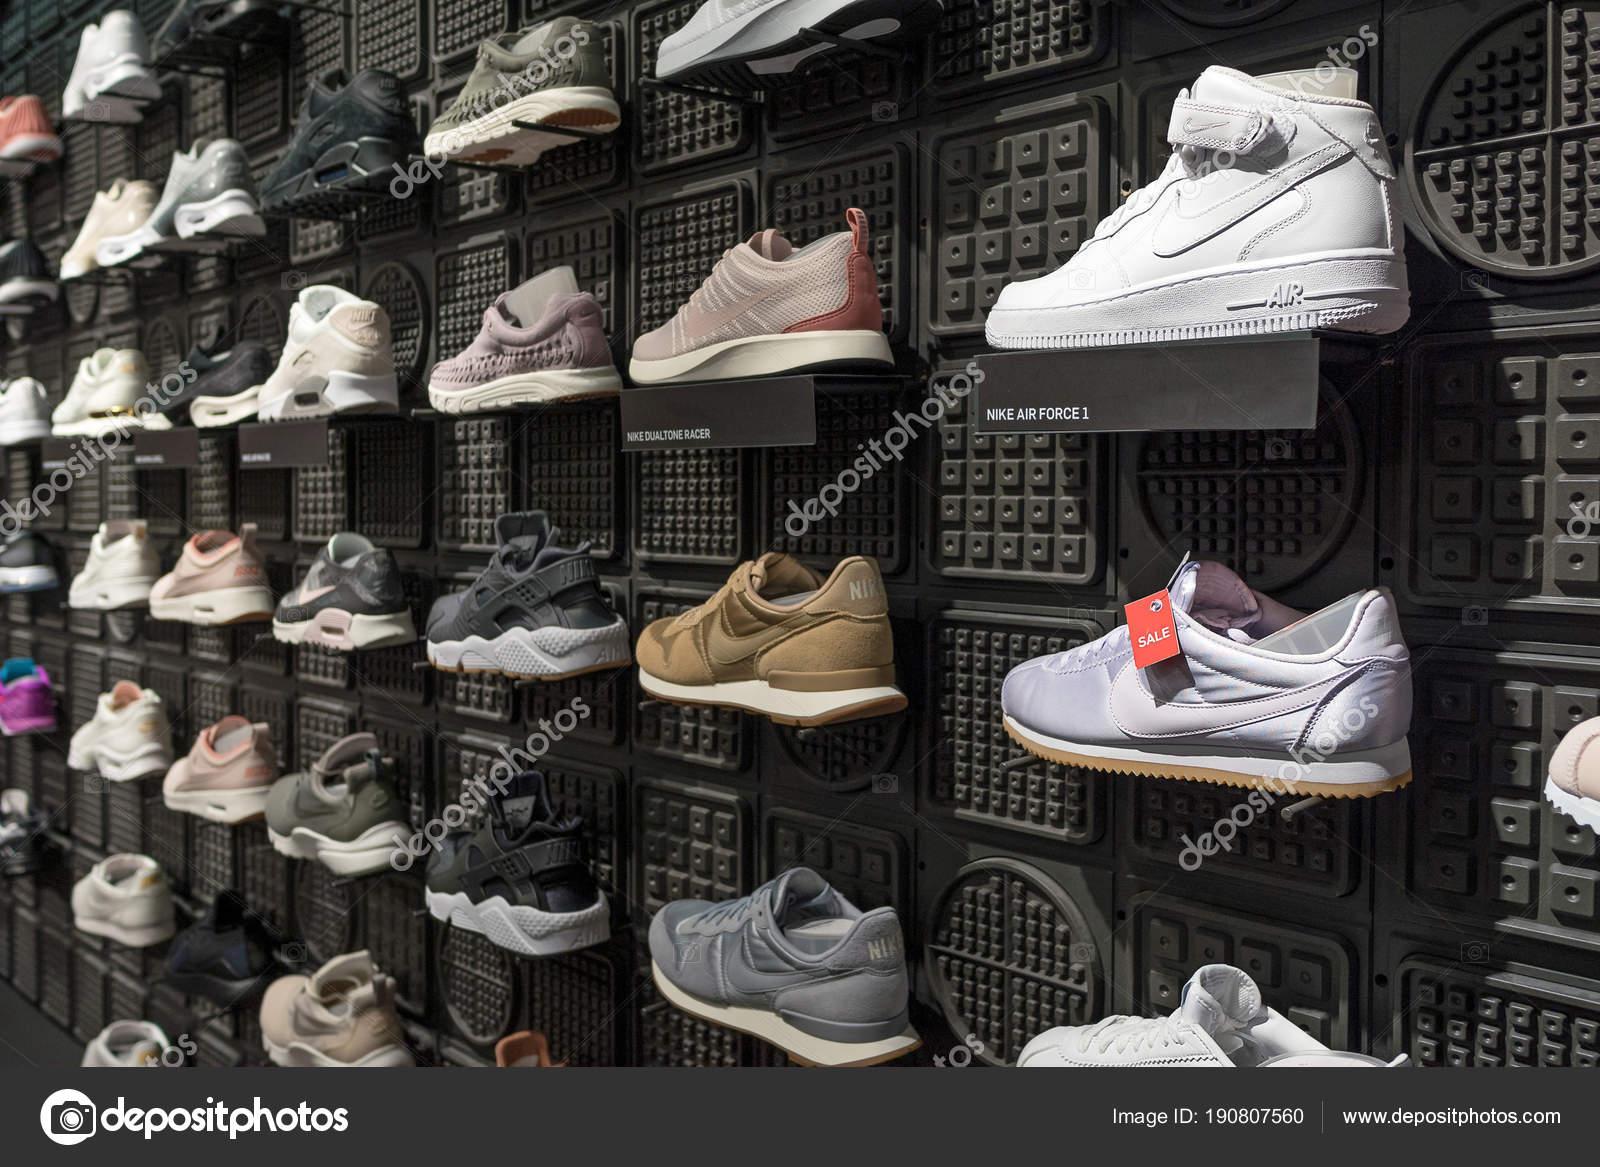 ef7abaef42a Βερολίνο, Γερμανία - Circa Ιουλίου 2017: Έκθεση της nike αθλητικά παπούτσια.  Nike είναι ένας από τους παγκόσμιους μεγαλύτερους προμηθευτές αθλητικά ...